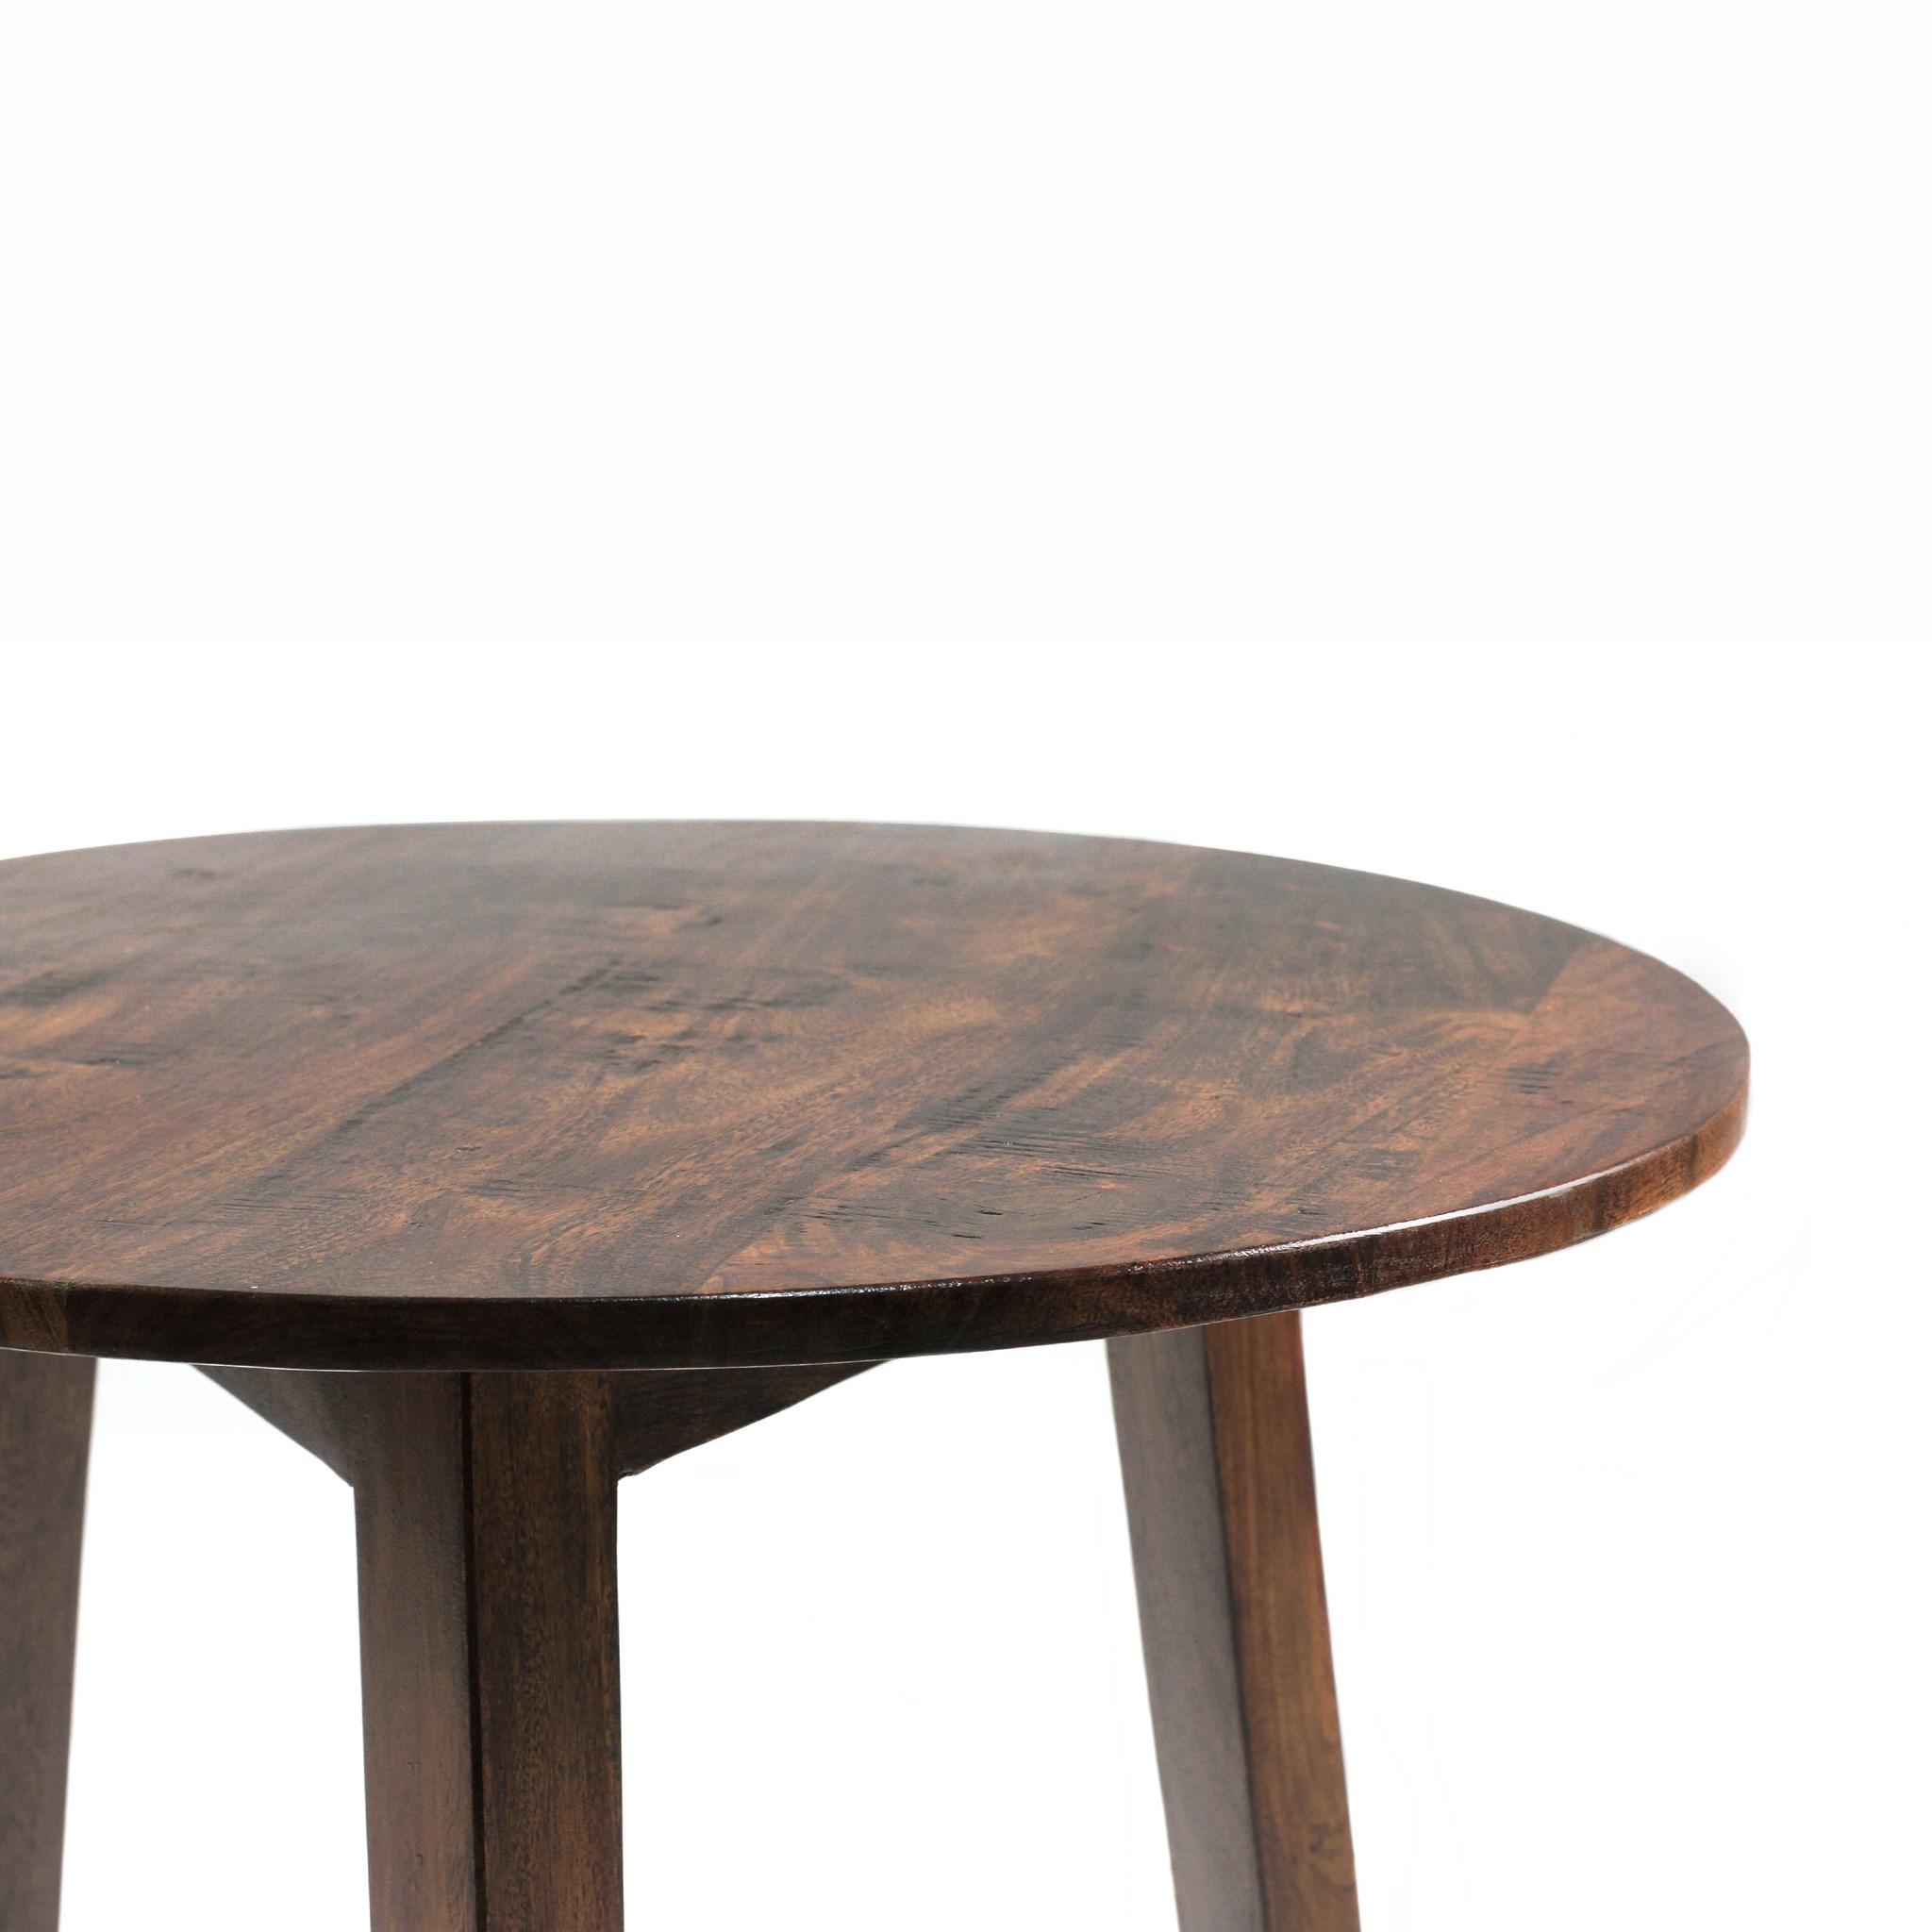 Cricket Table Chestnut 26x26x26